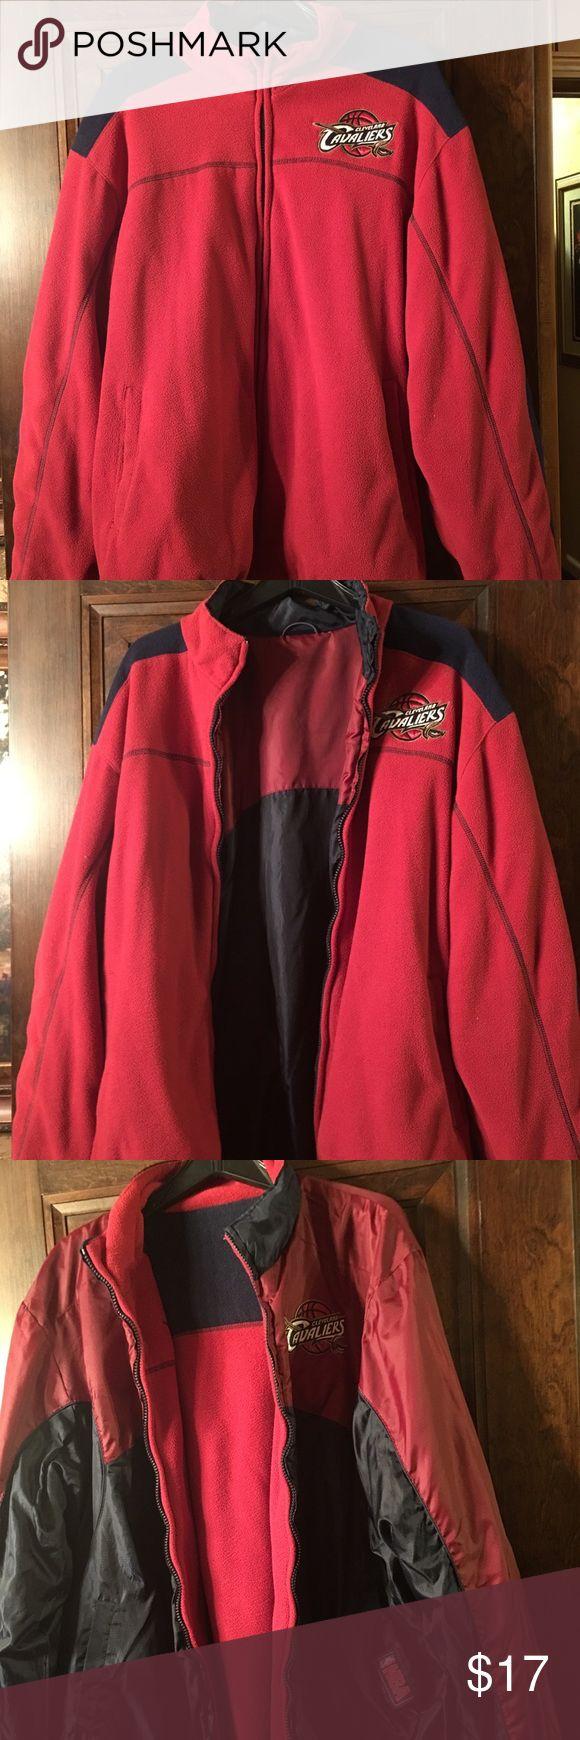 Cleveland Cavaliers reversible fleece size xl Size xl reversible fleece nba brand in gently used great condition nba Shirts Sweatshirts & Hoodies